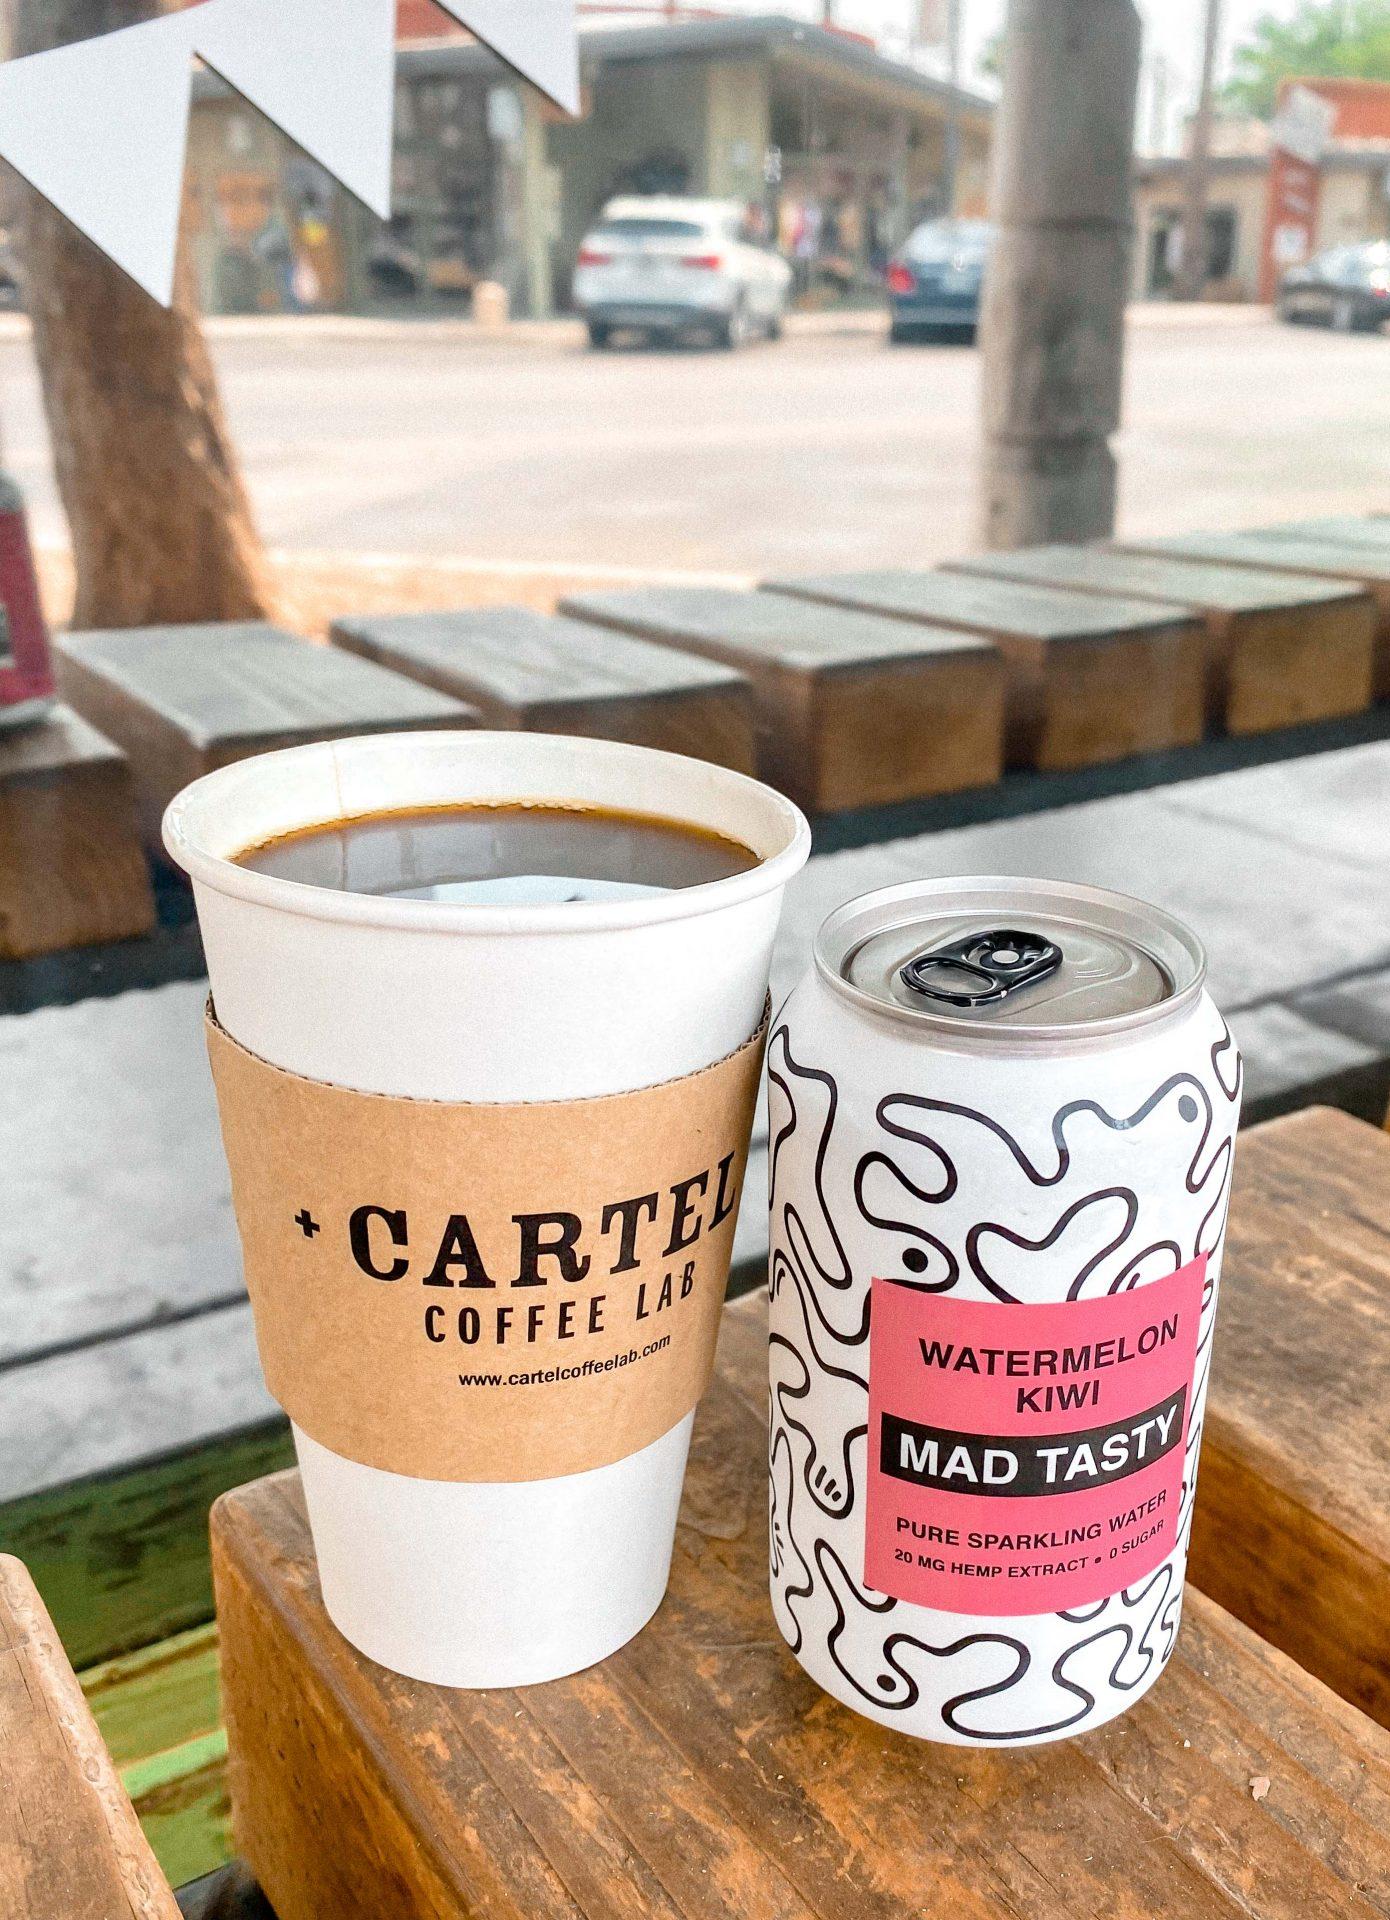 scottsdale arizona, cartel coffee, best coffee shops in scottsdale Arizona, travel blog, best spots, Arizona, scottsdale Arizona, old town scottsdale, the best travel blog